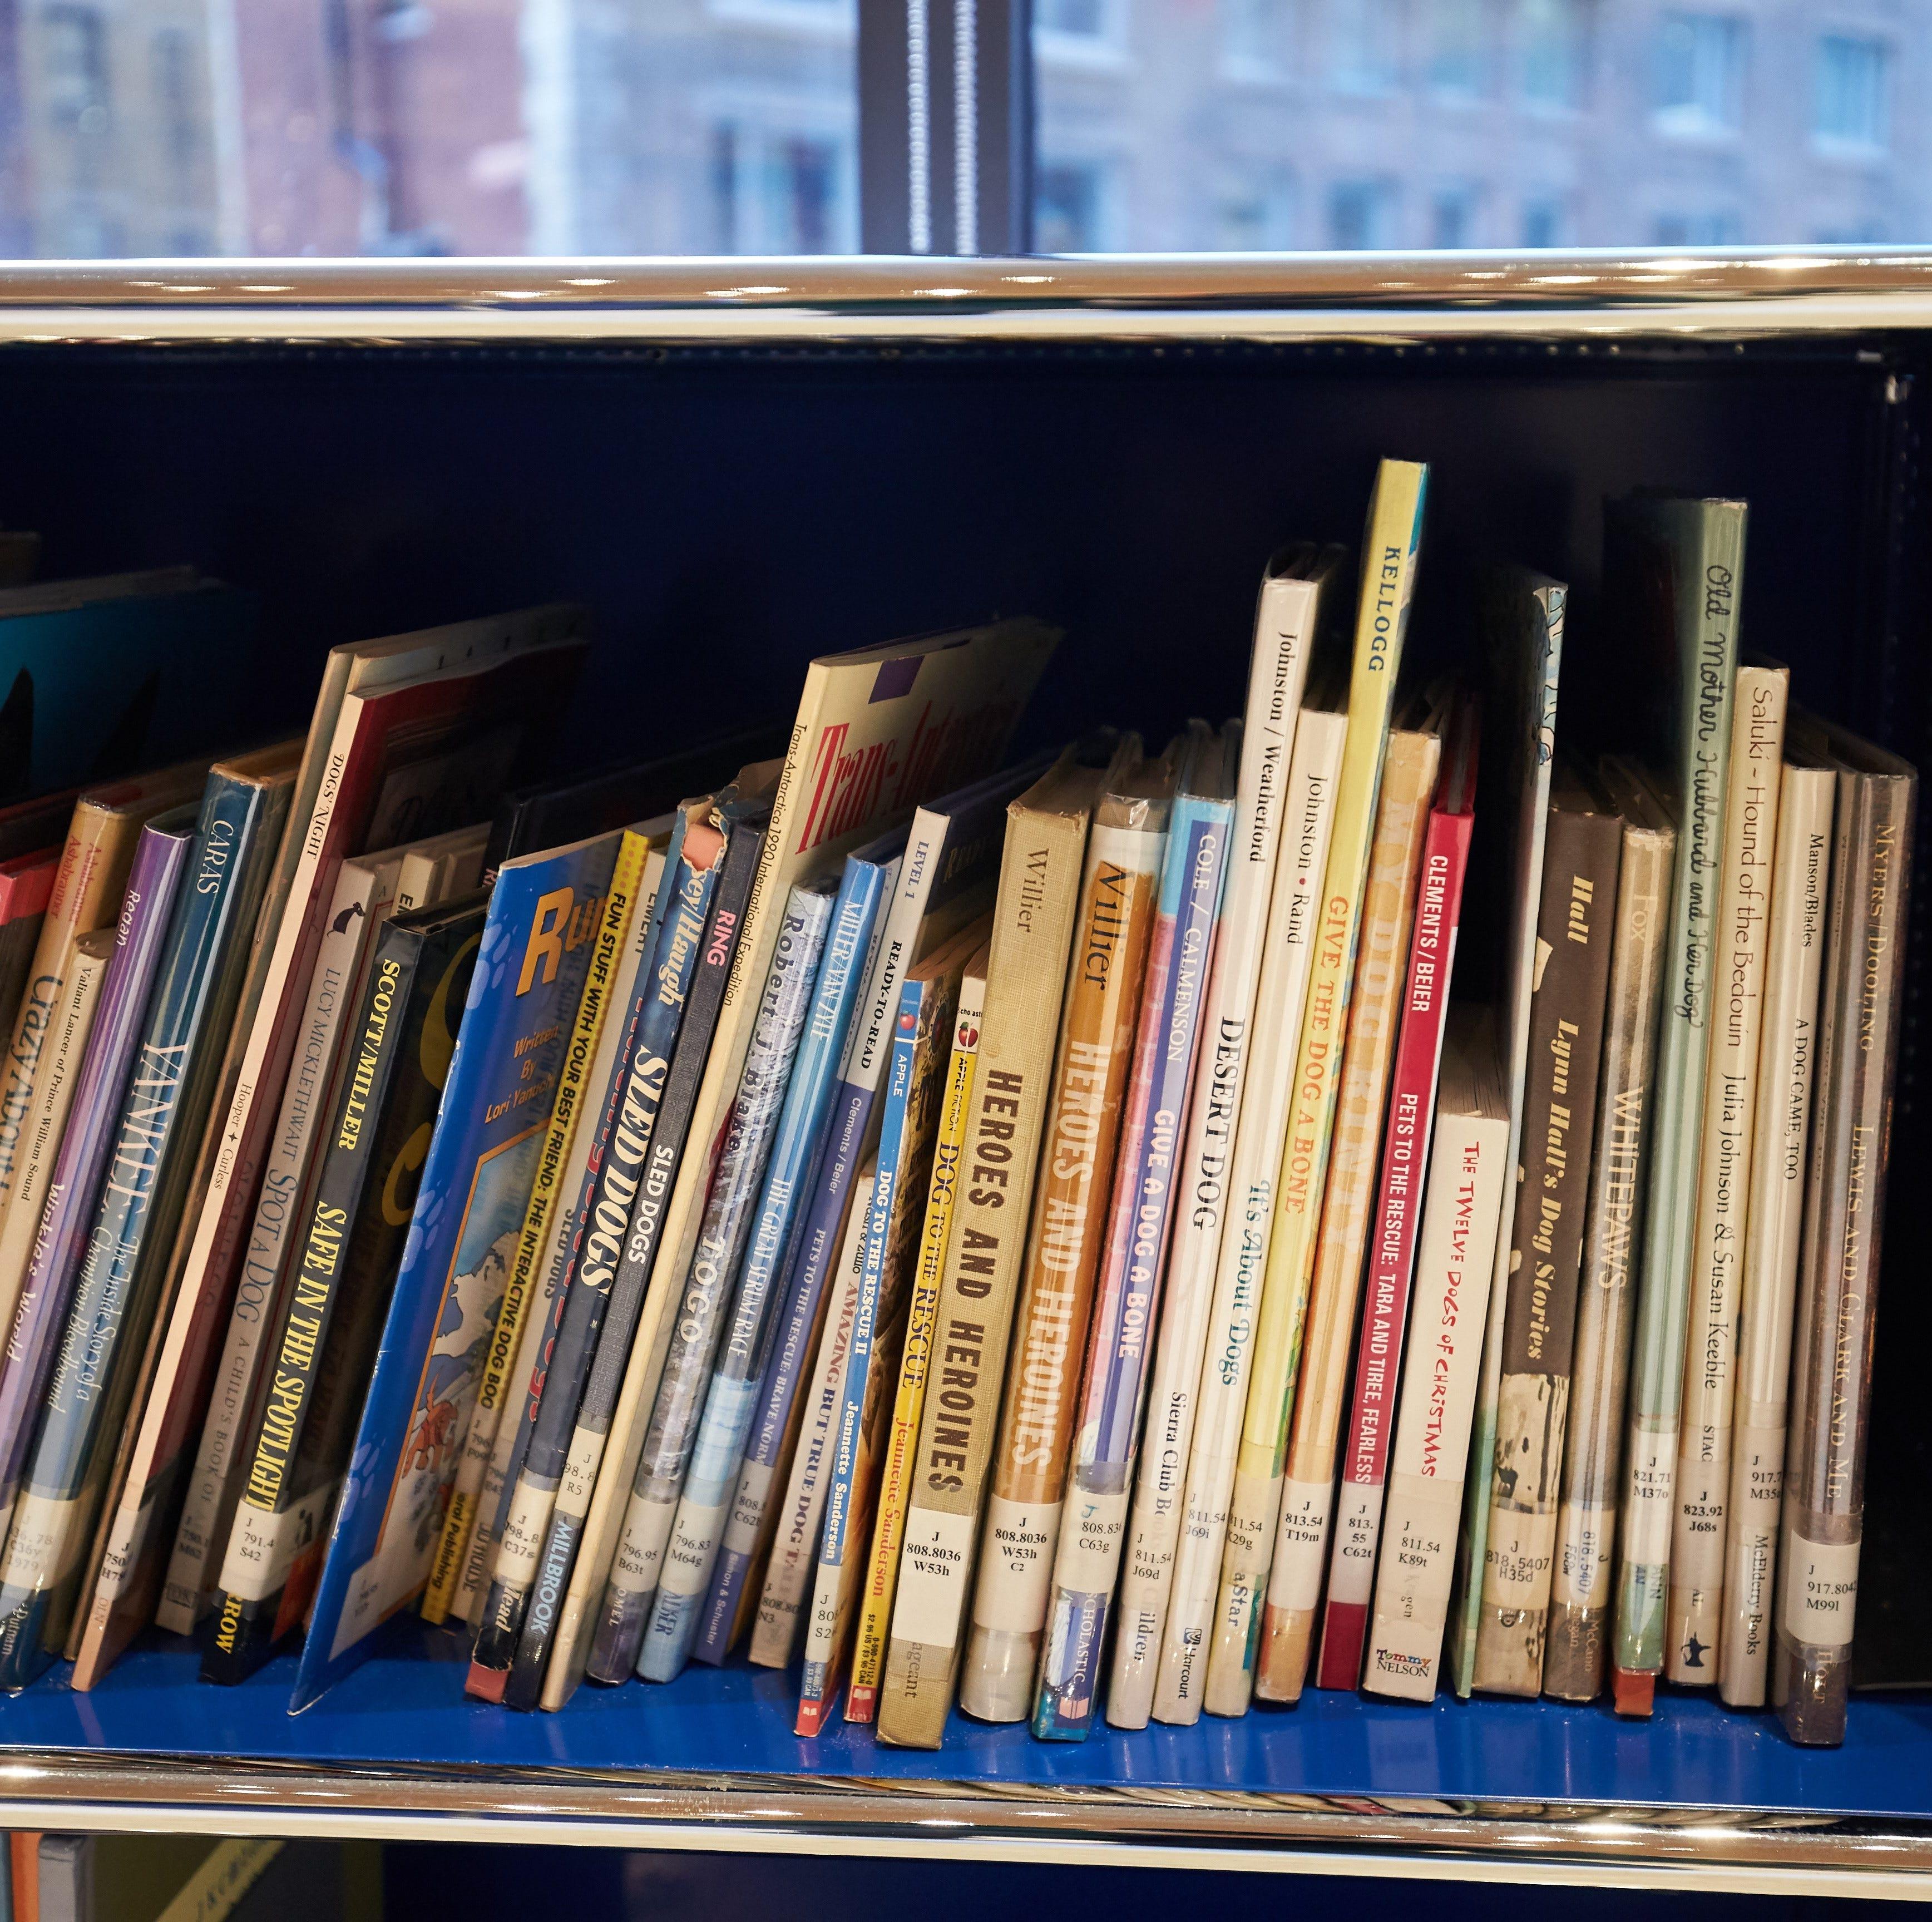 Children's books abound at Carlsbad Public Library